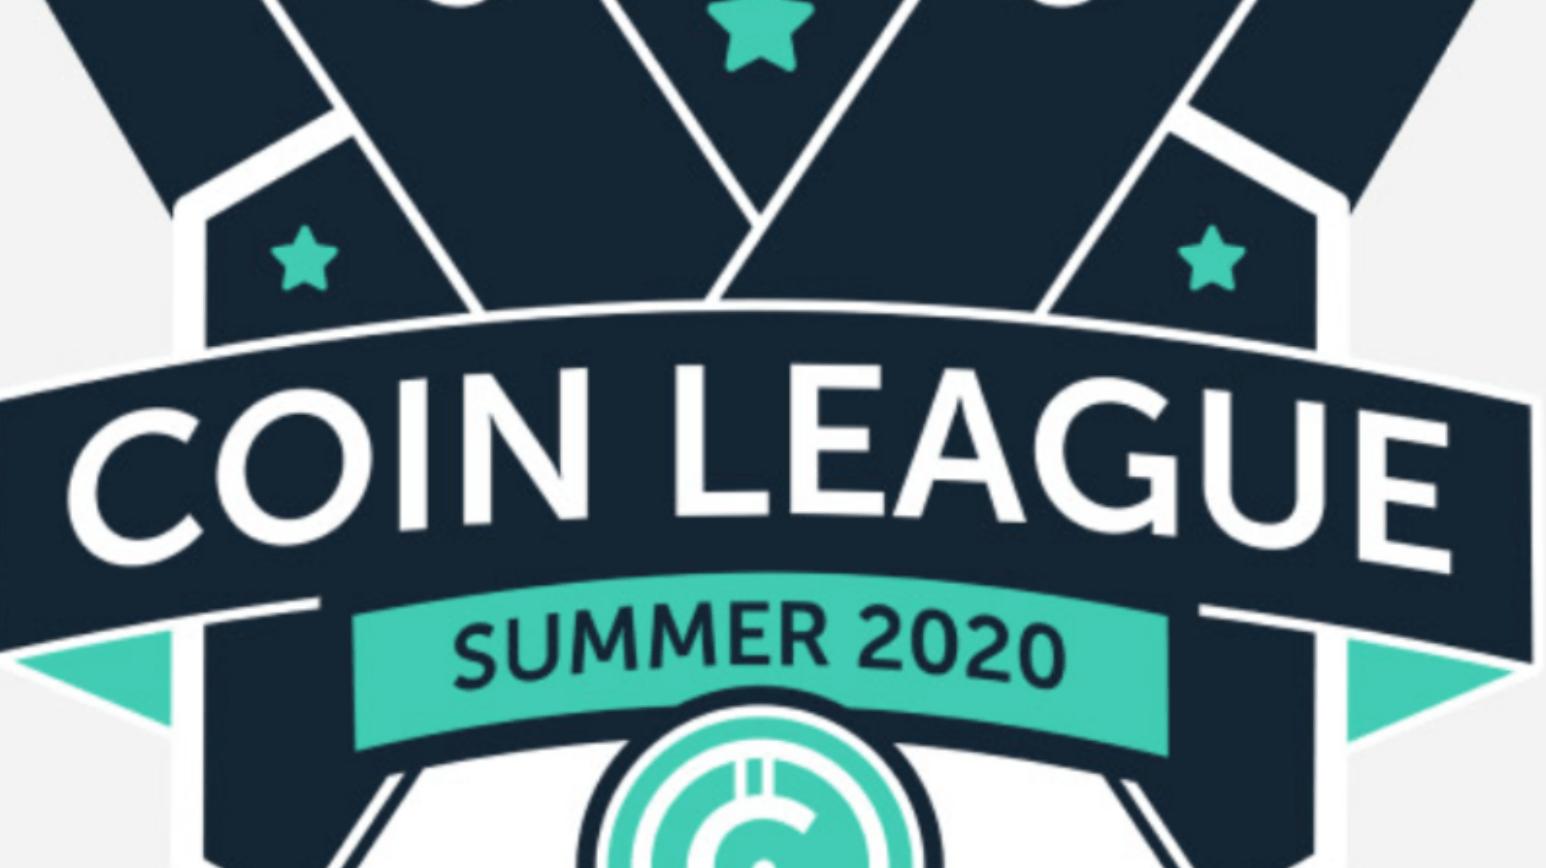 Coin League 2020